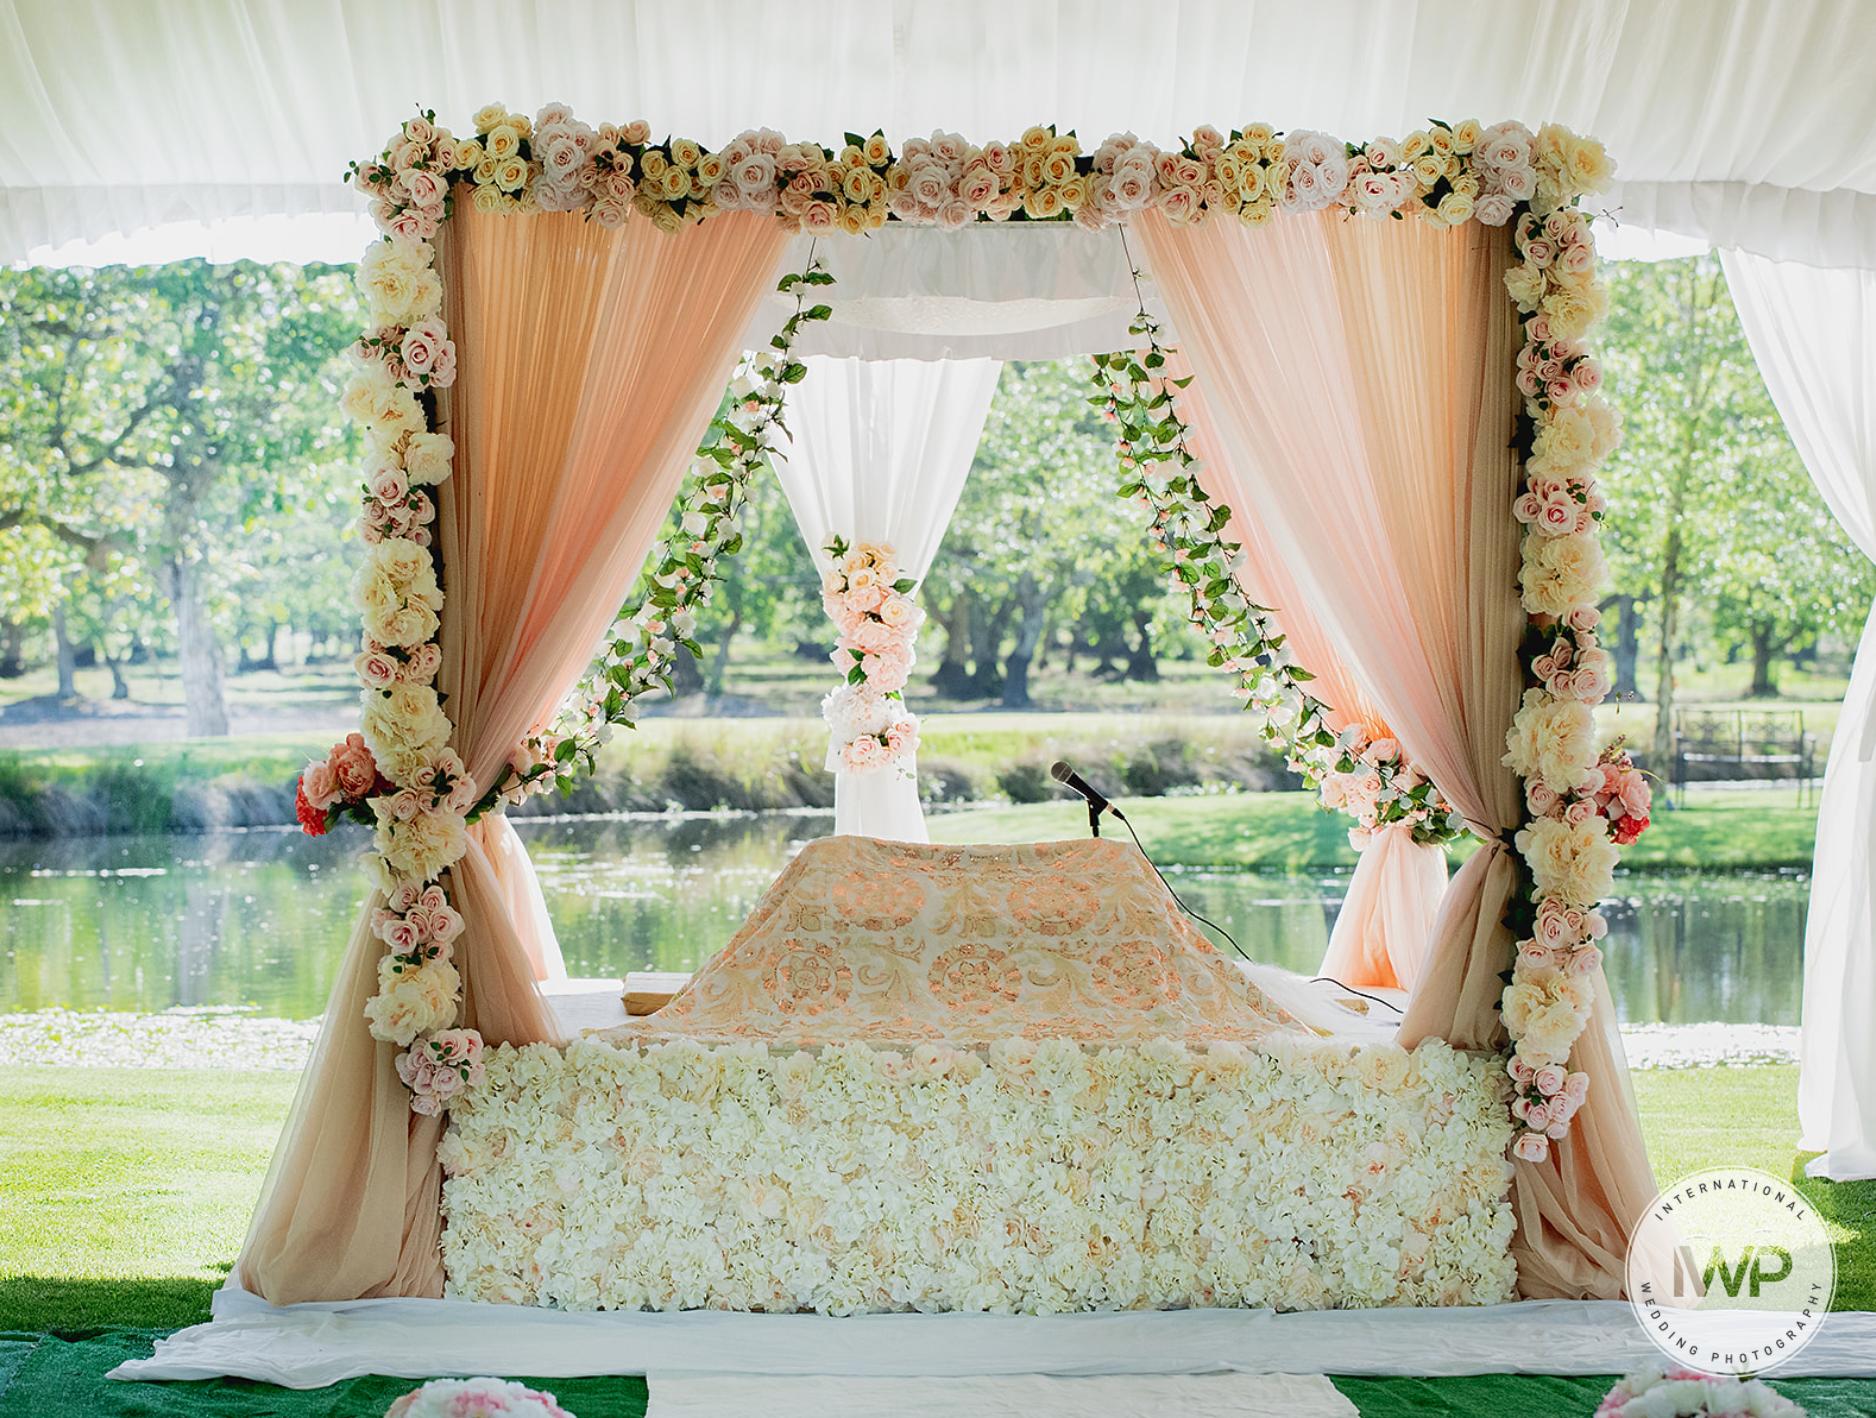 Harleen & Amit - Ceremony & Reception Decorations!